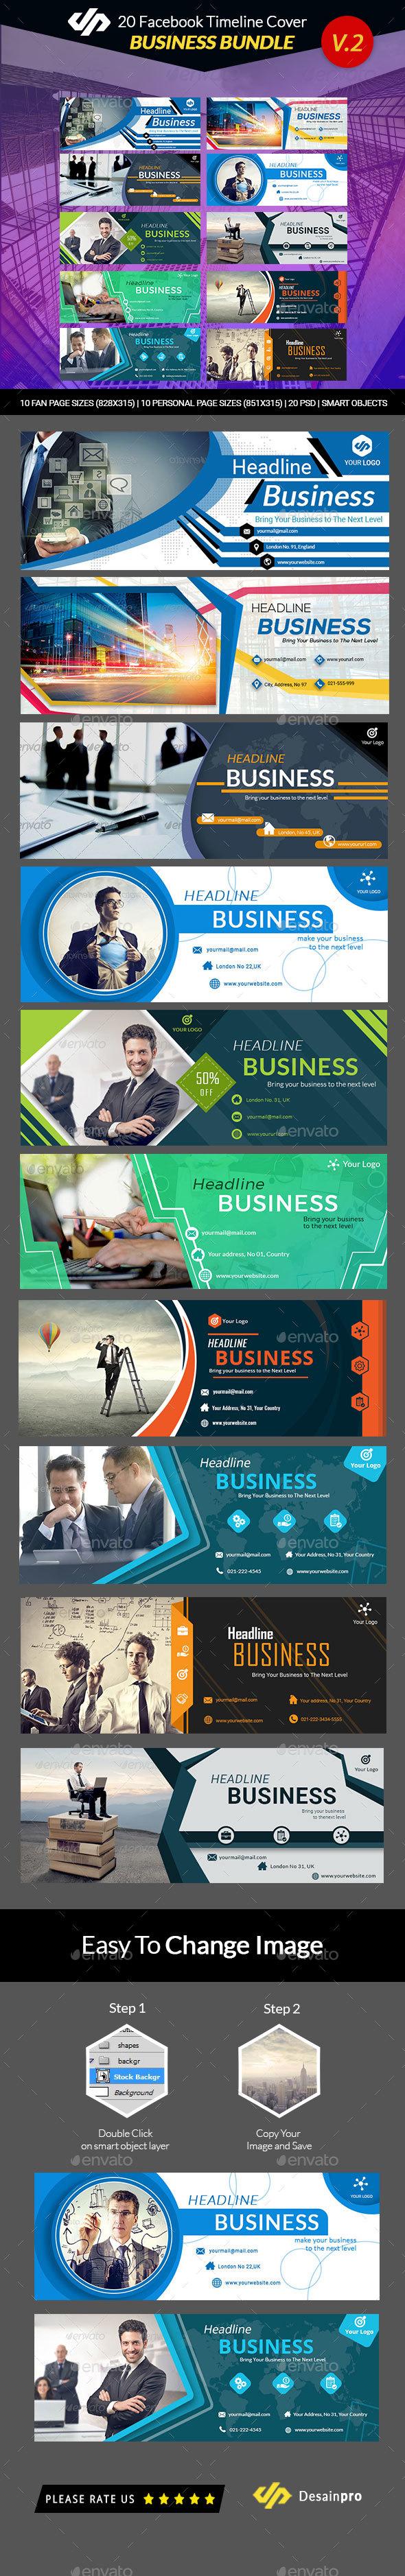 GraphicRiver 20 FB Business Timeline Covers Bundle V2 AR 21179643